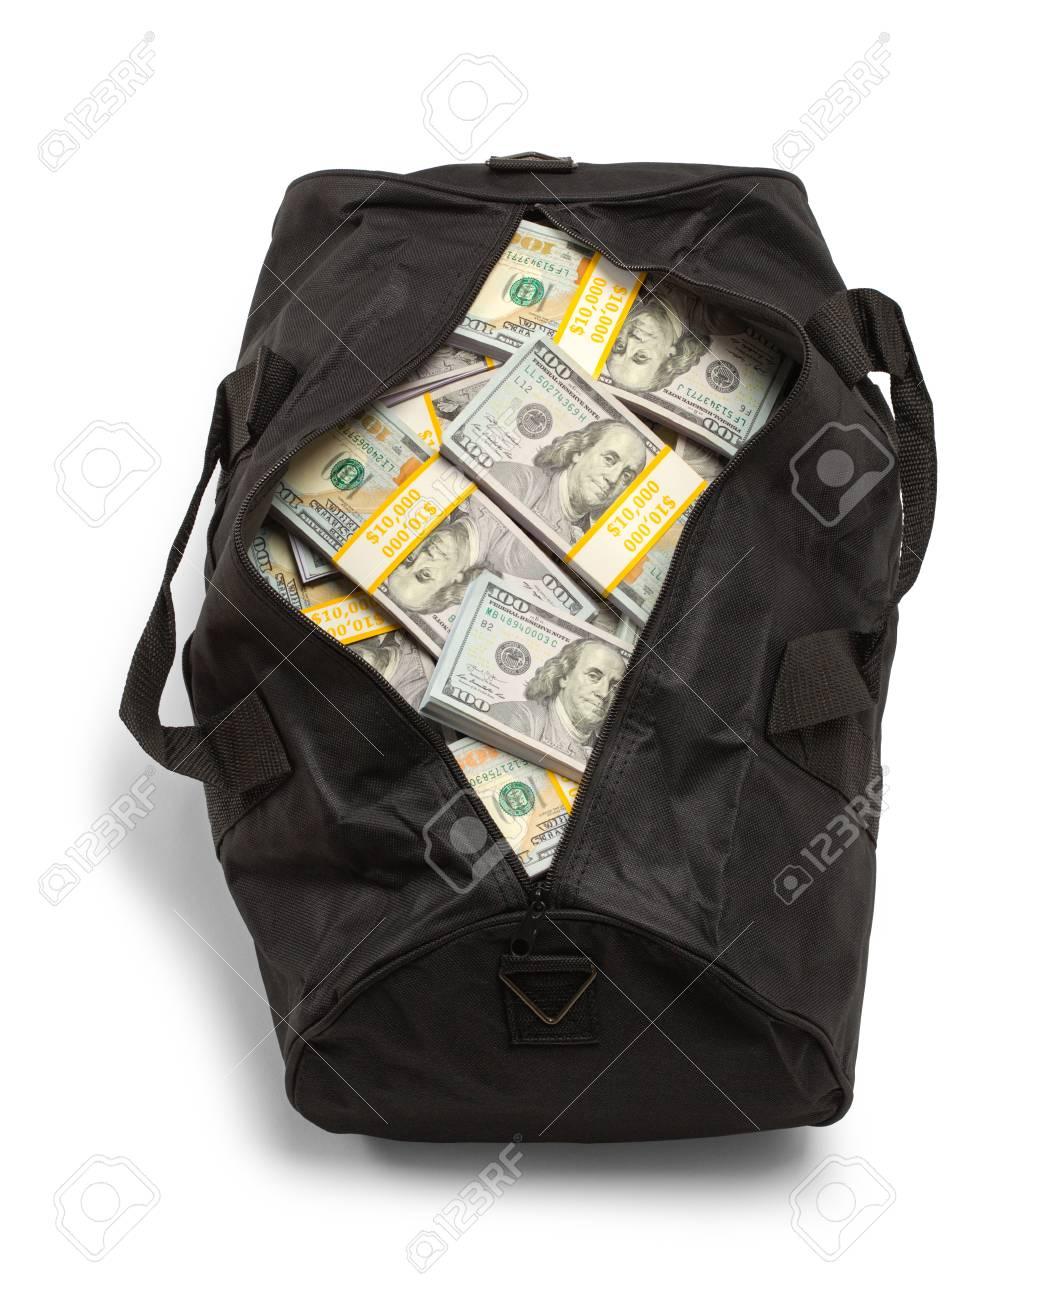 101784351-black-duffel-bag-full-of-money